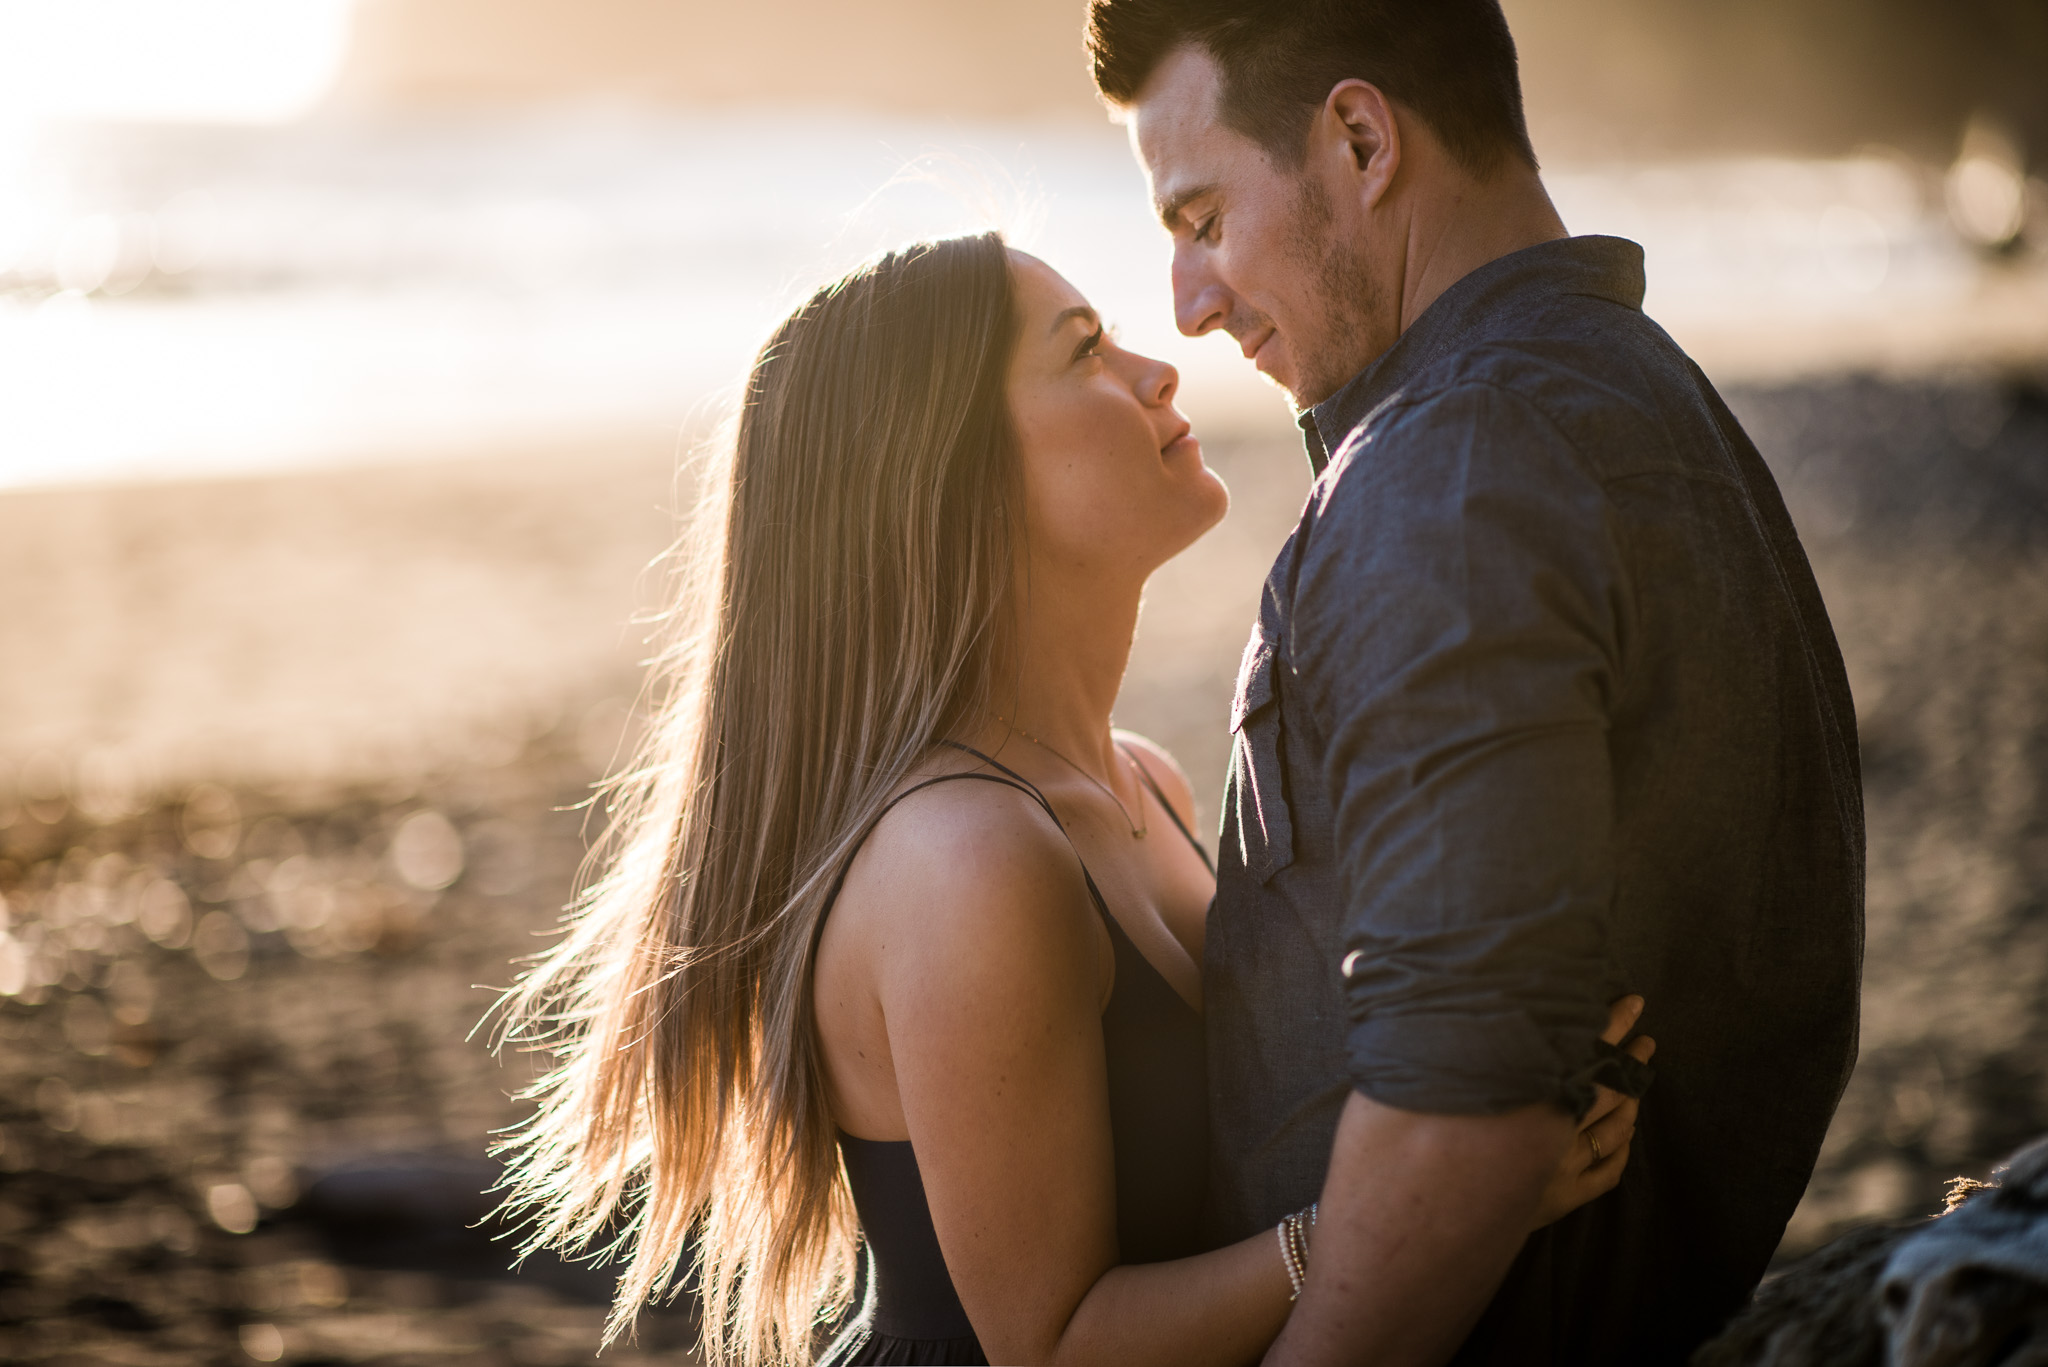 mystic-beach-engagement-victoria-wedding-photographer-16.jpg